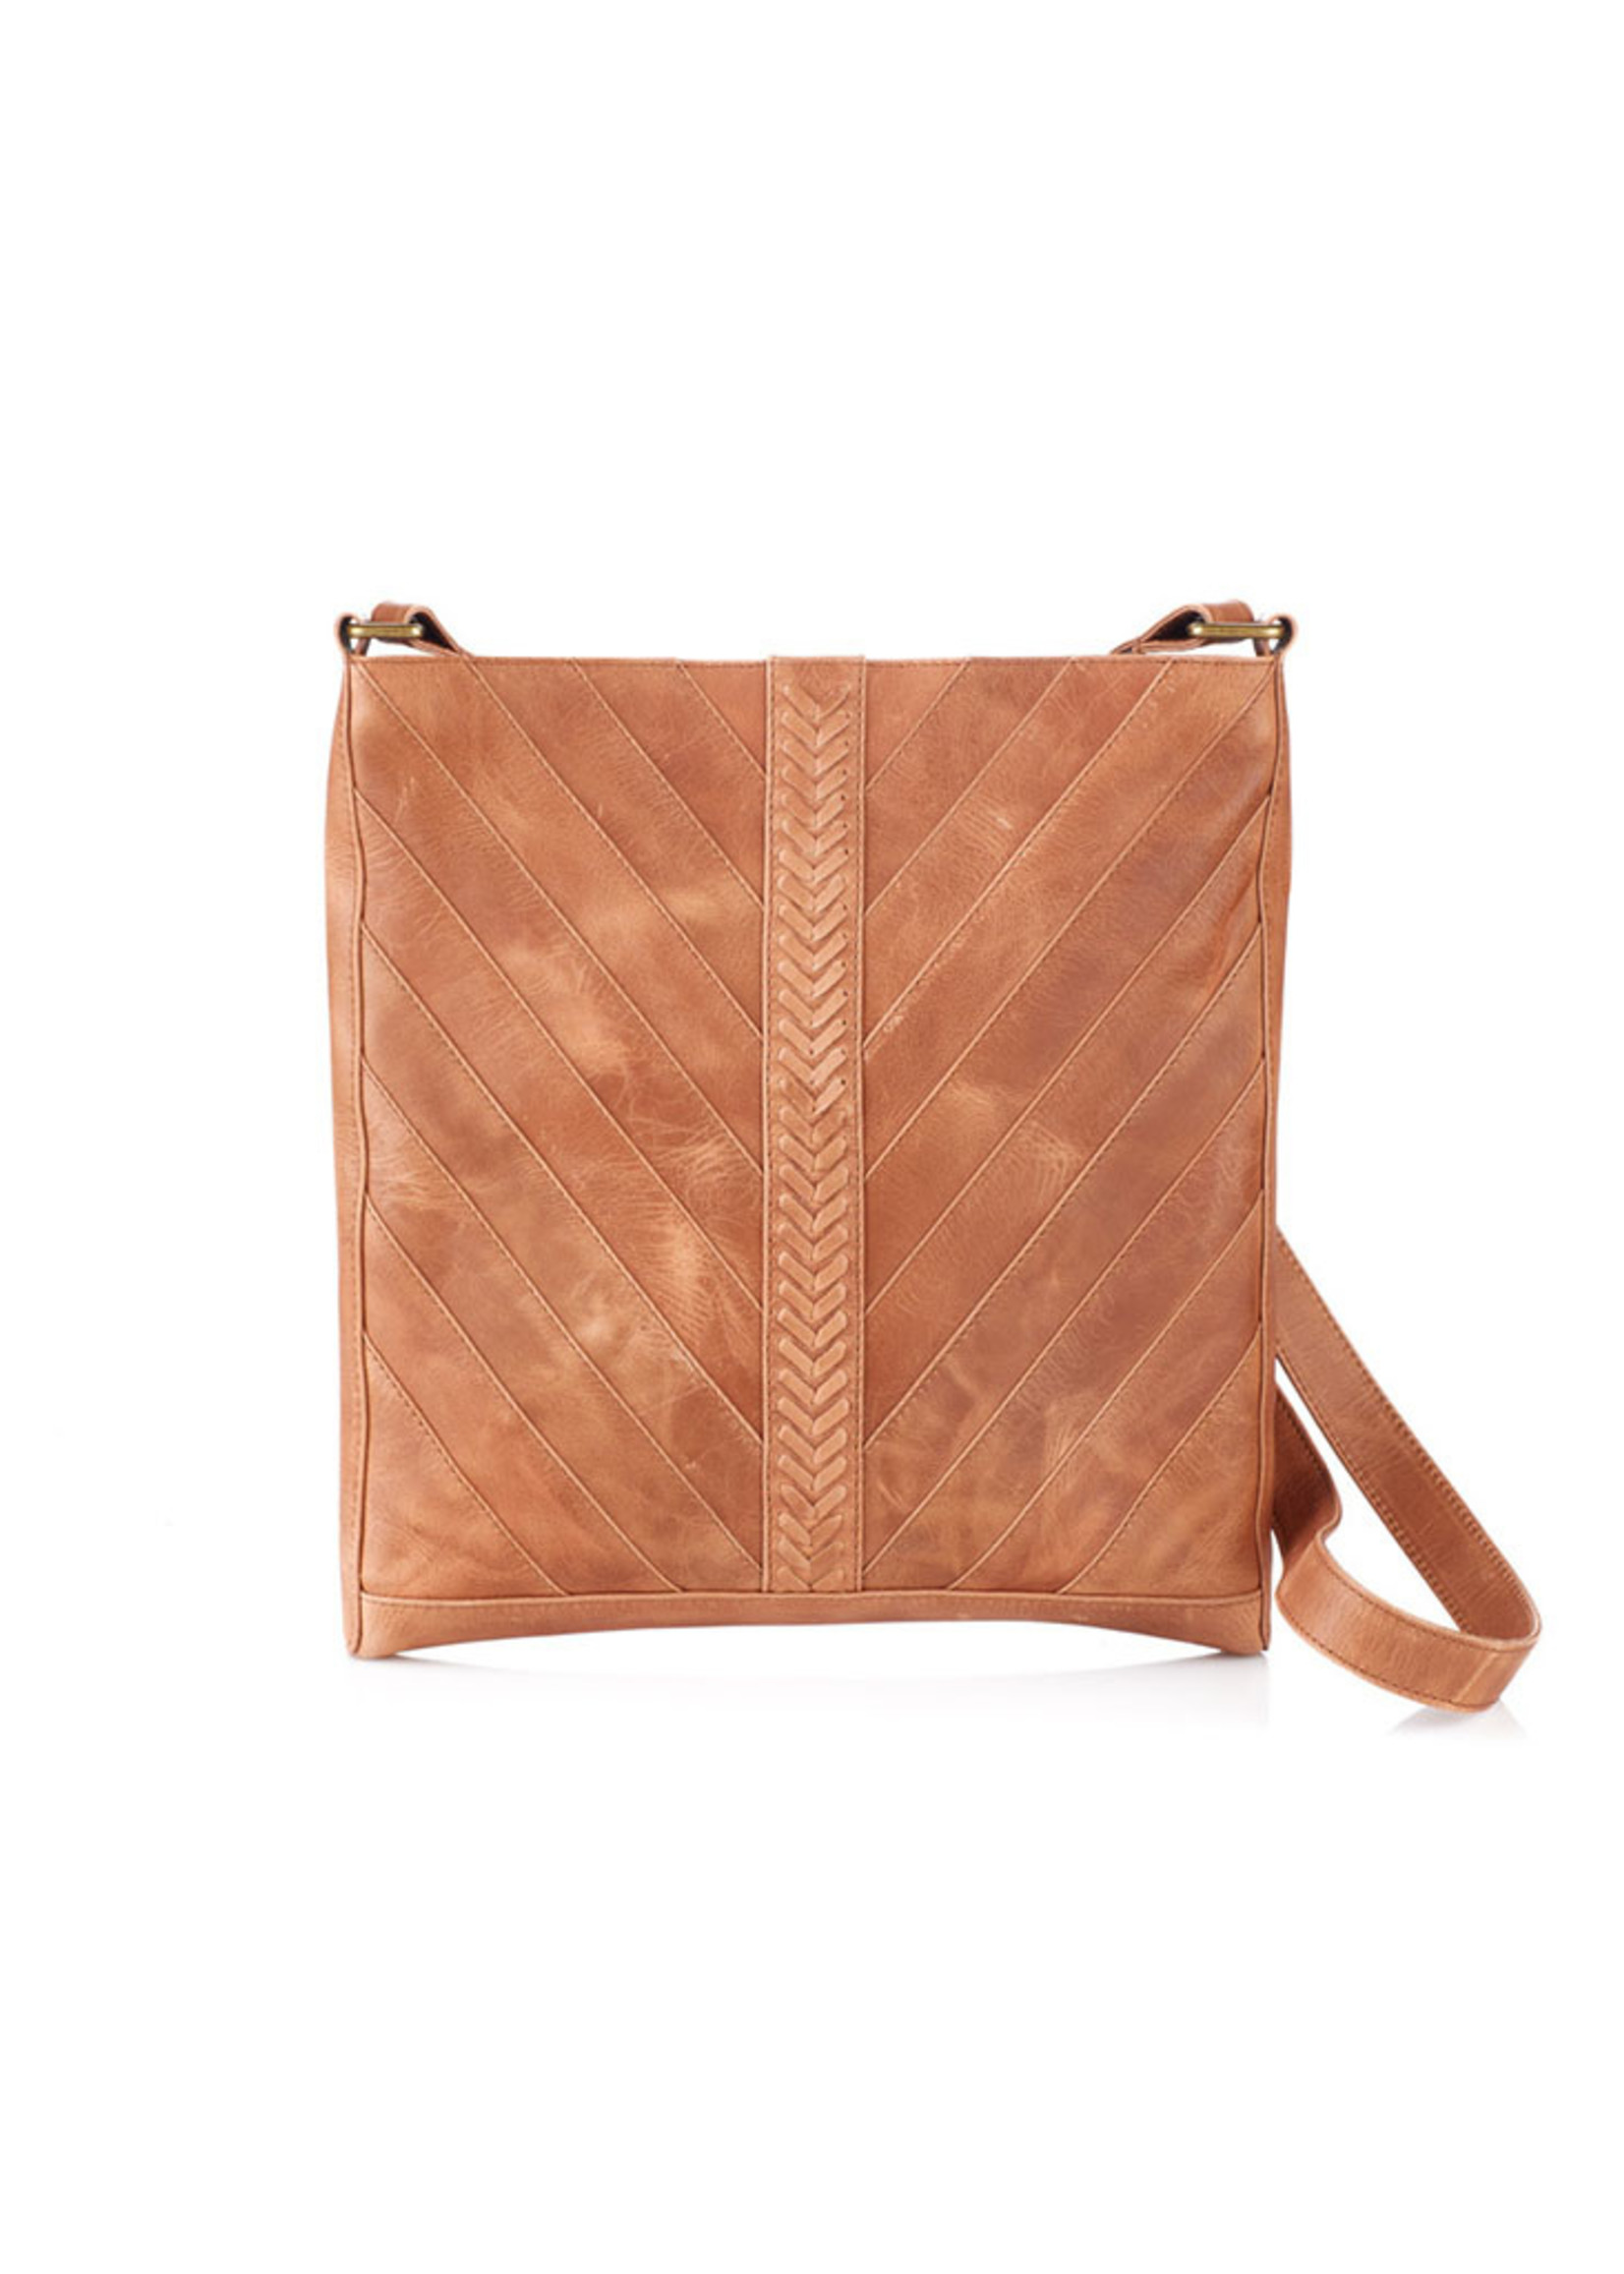 Ria Leather Crossbody Bag